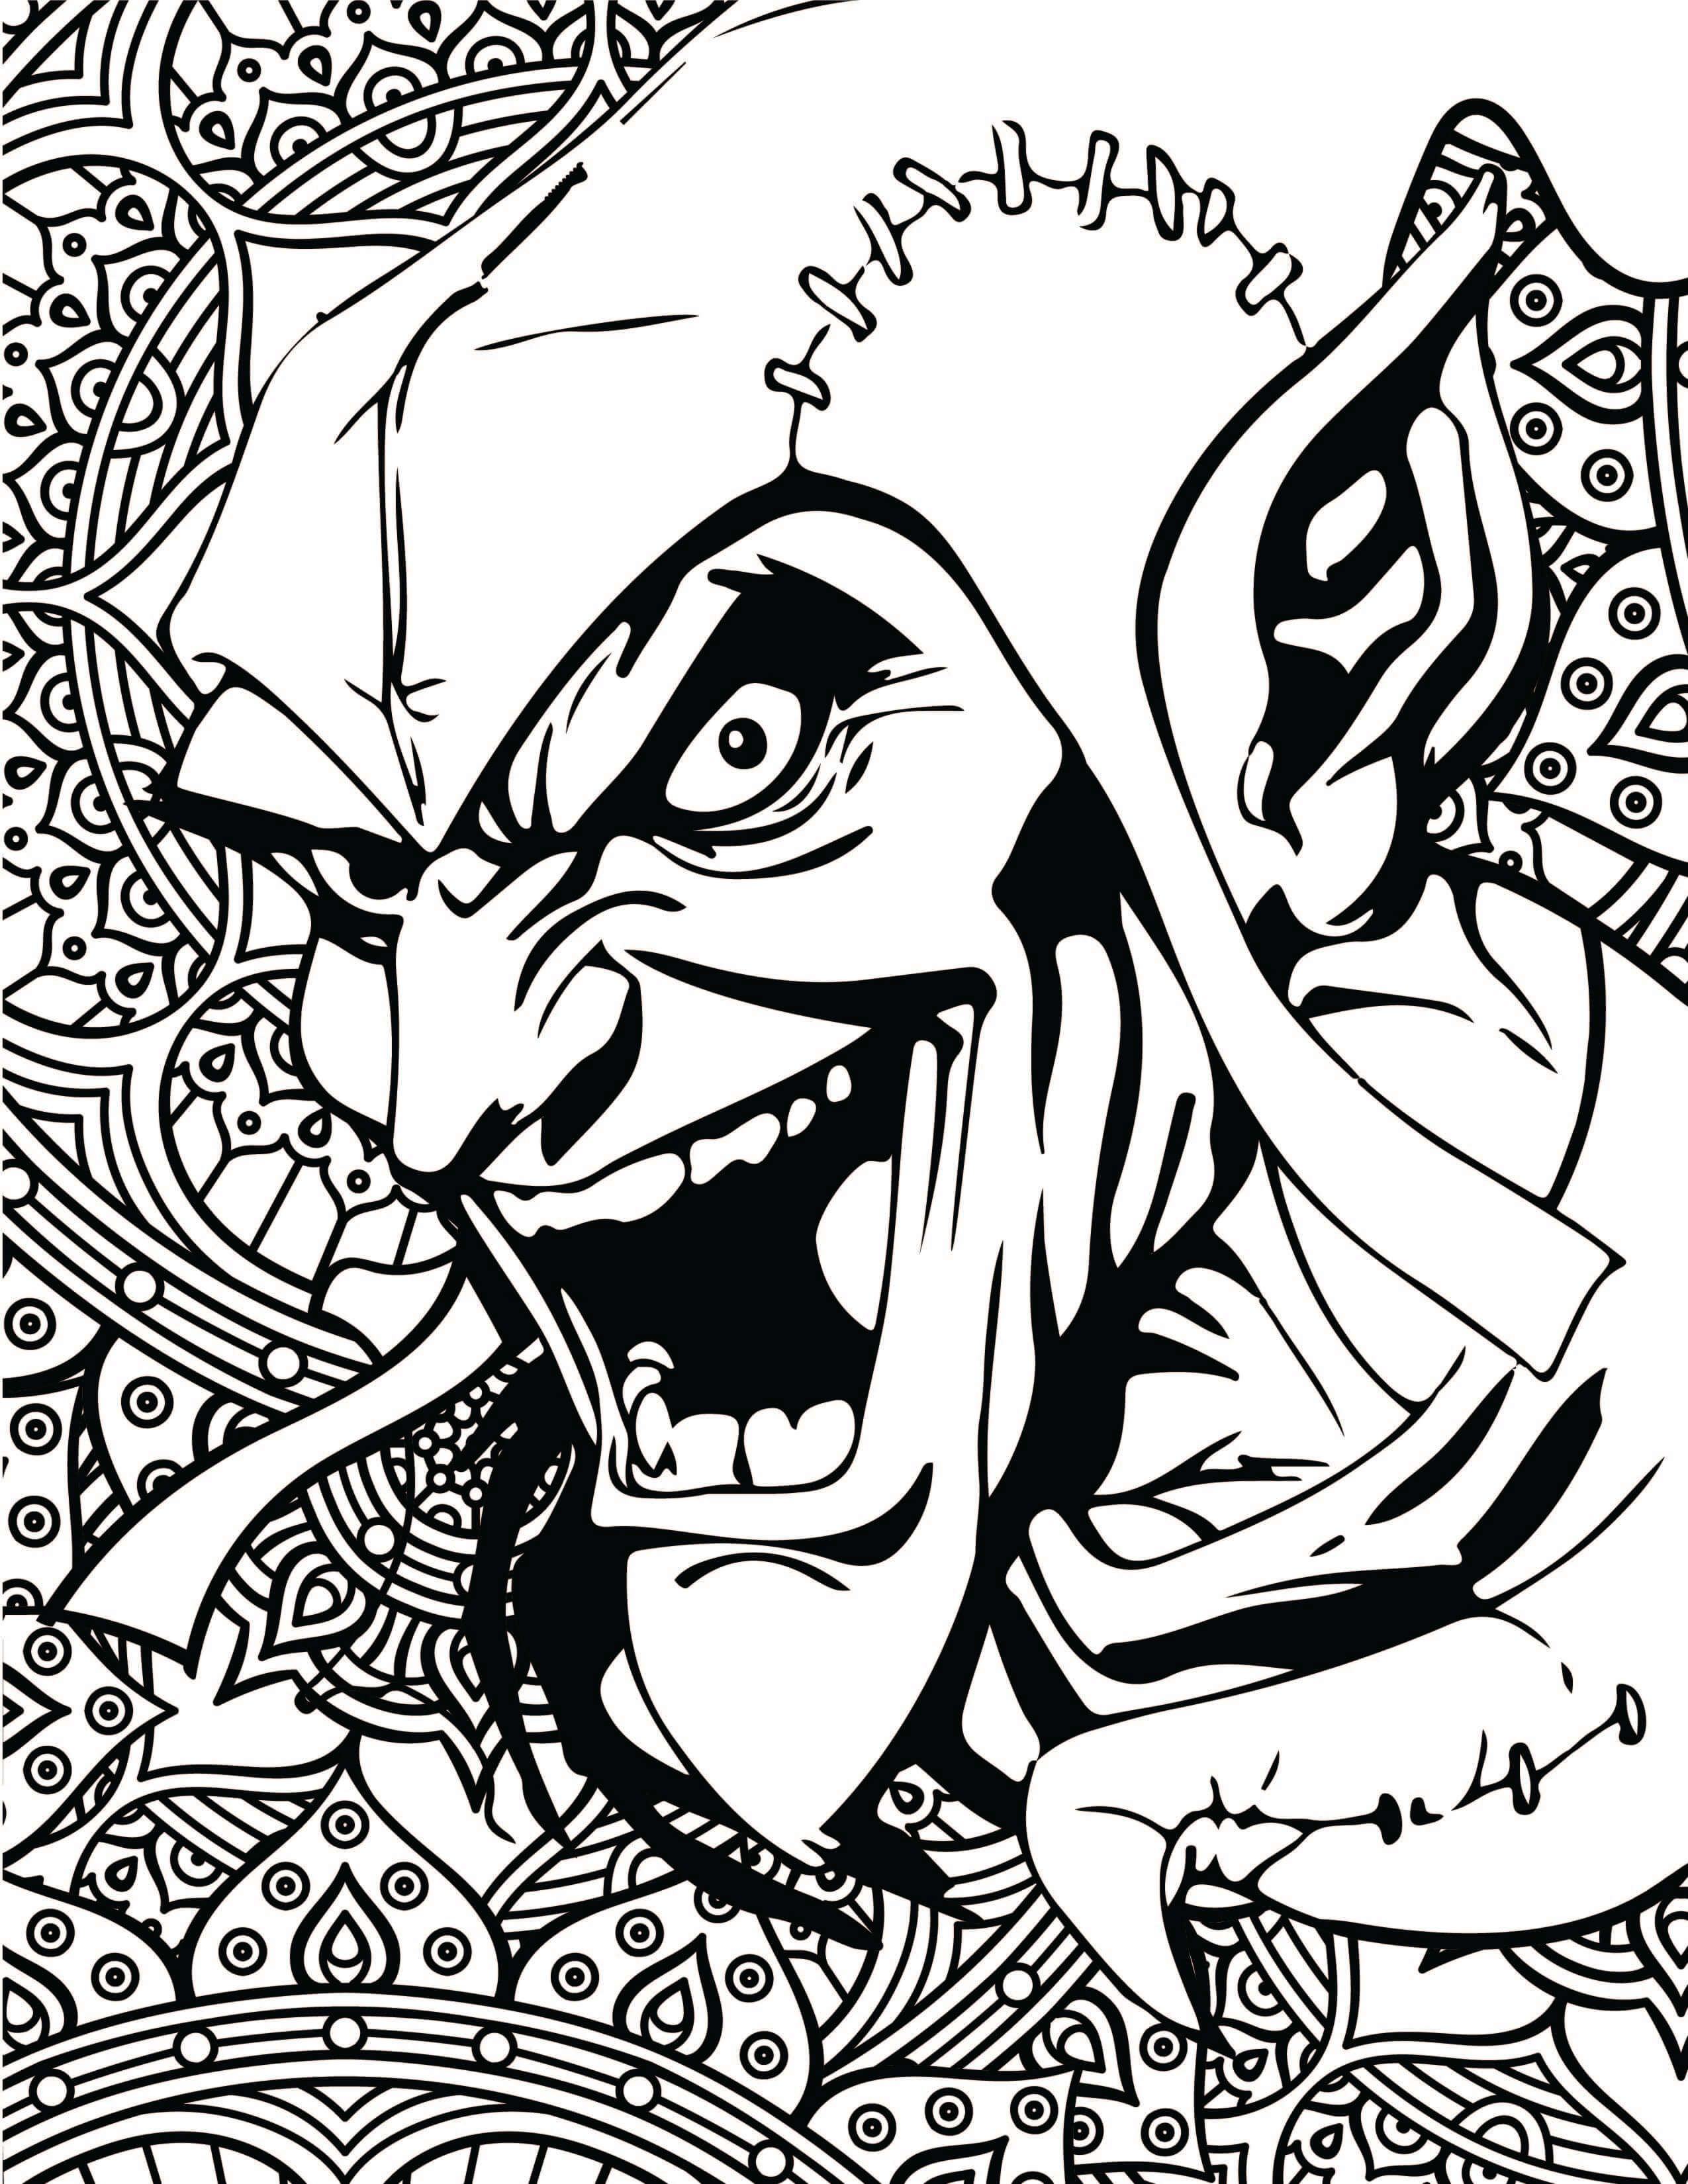 2550x3300 Marvel Villains Printable Coloring Pages Marvel Villains, Marvel